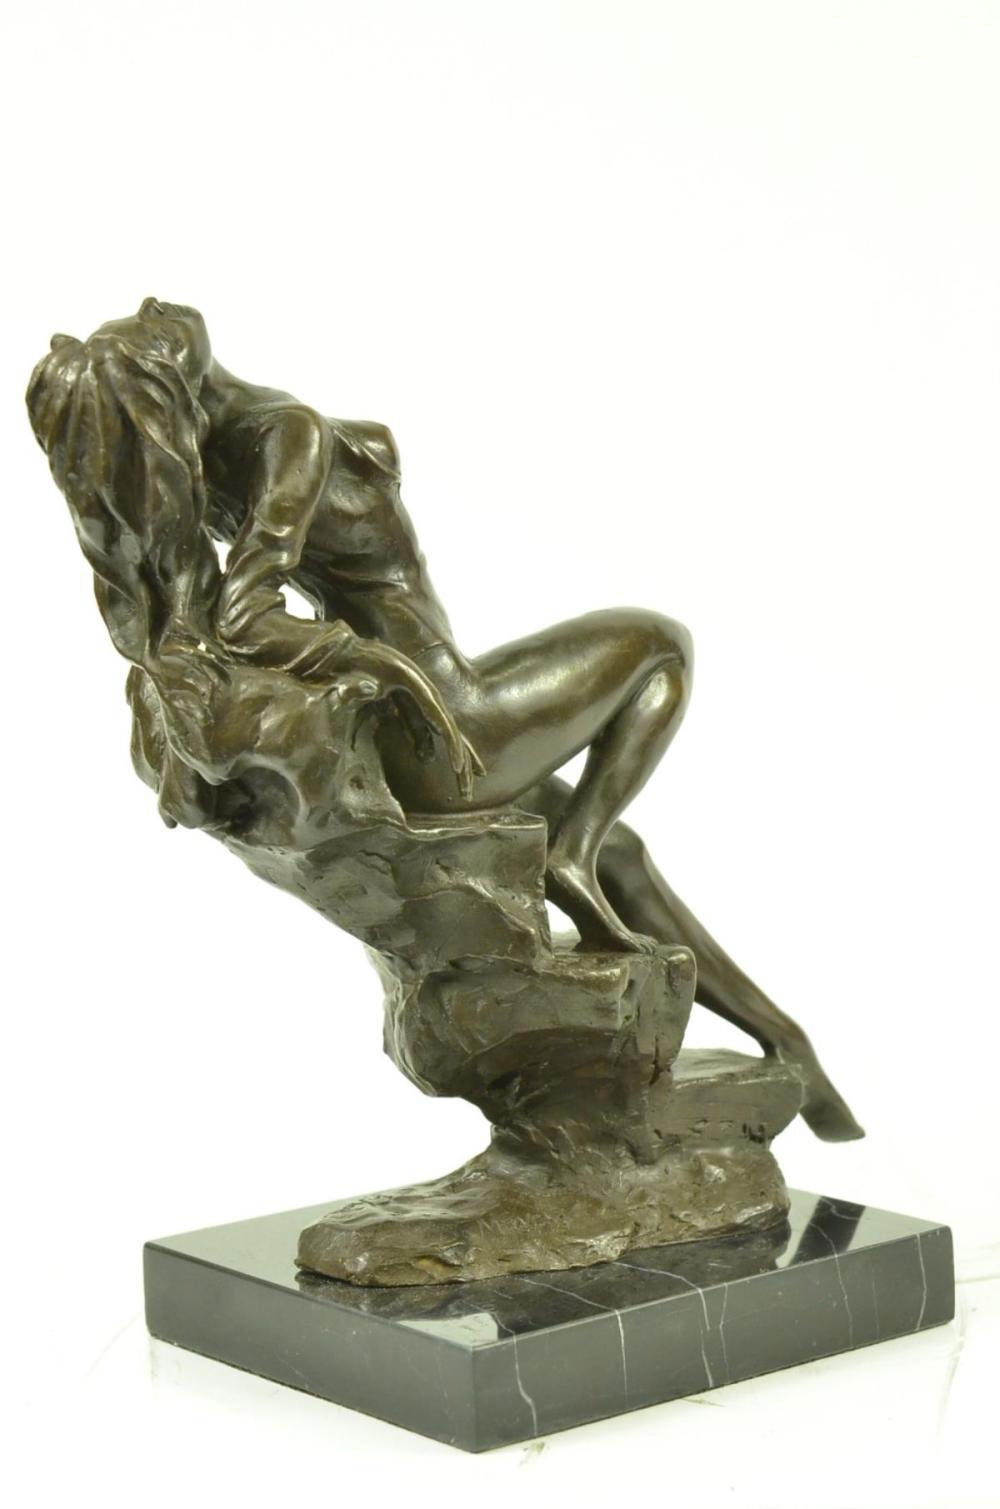 Erotic women sculpture in bronze finish